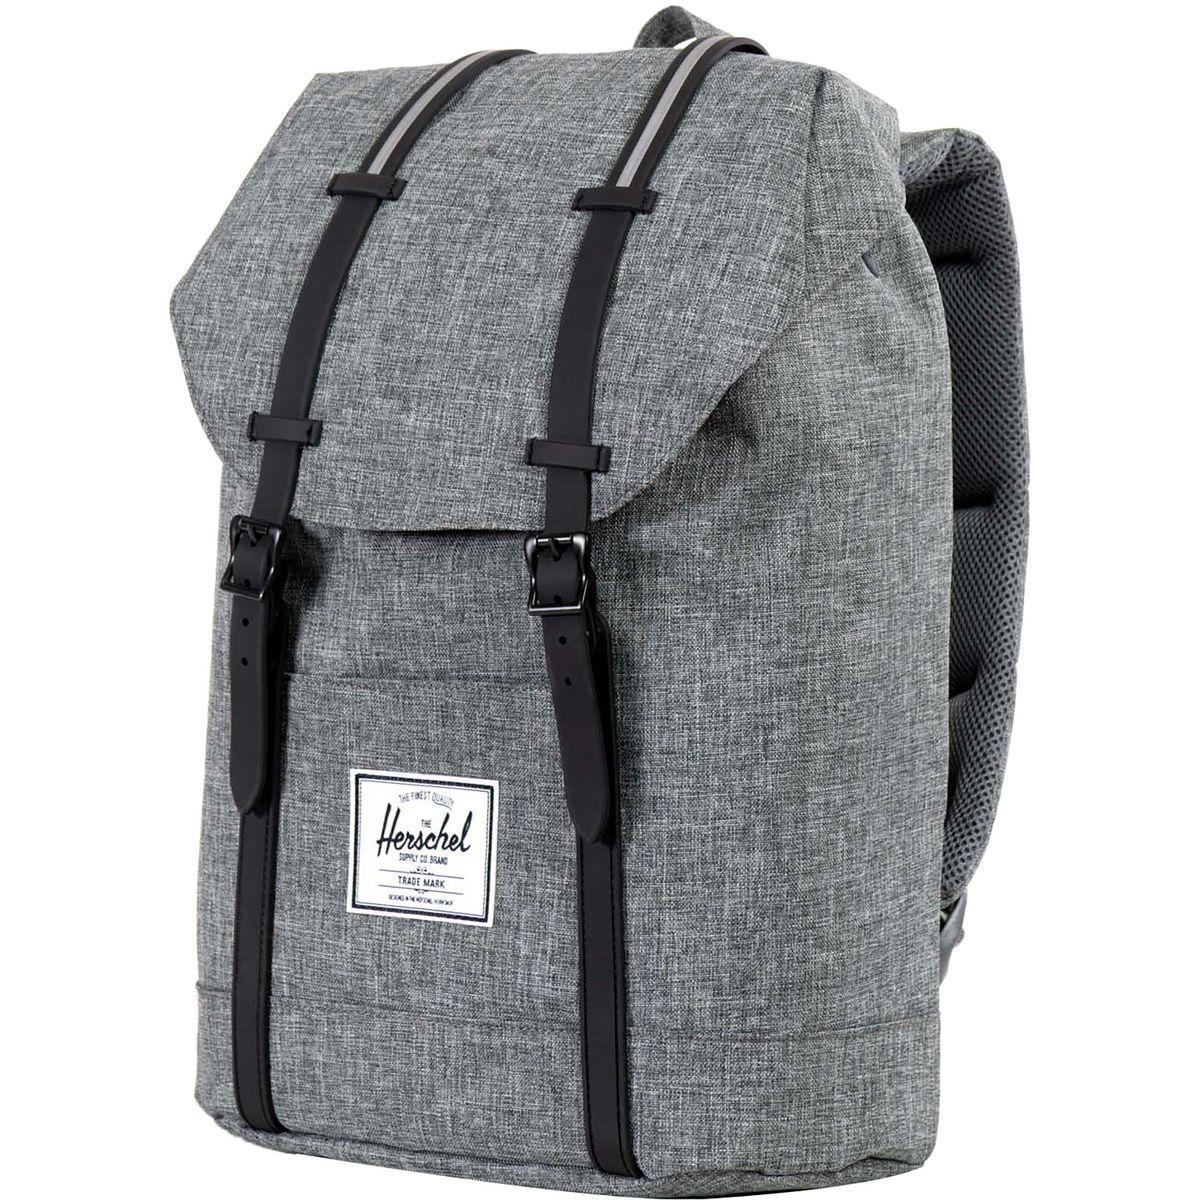 c75cf63de99a Lyst - Herschel Supply Co. Retreat 19.5l Backpack in Black